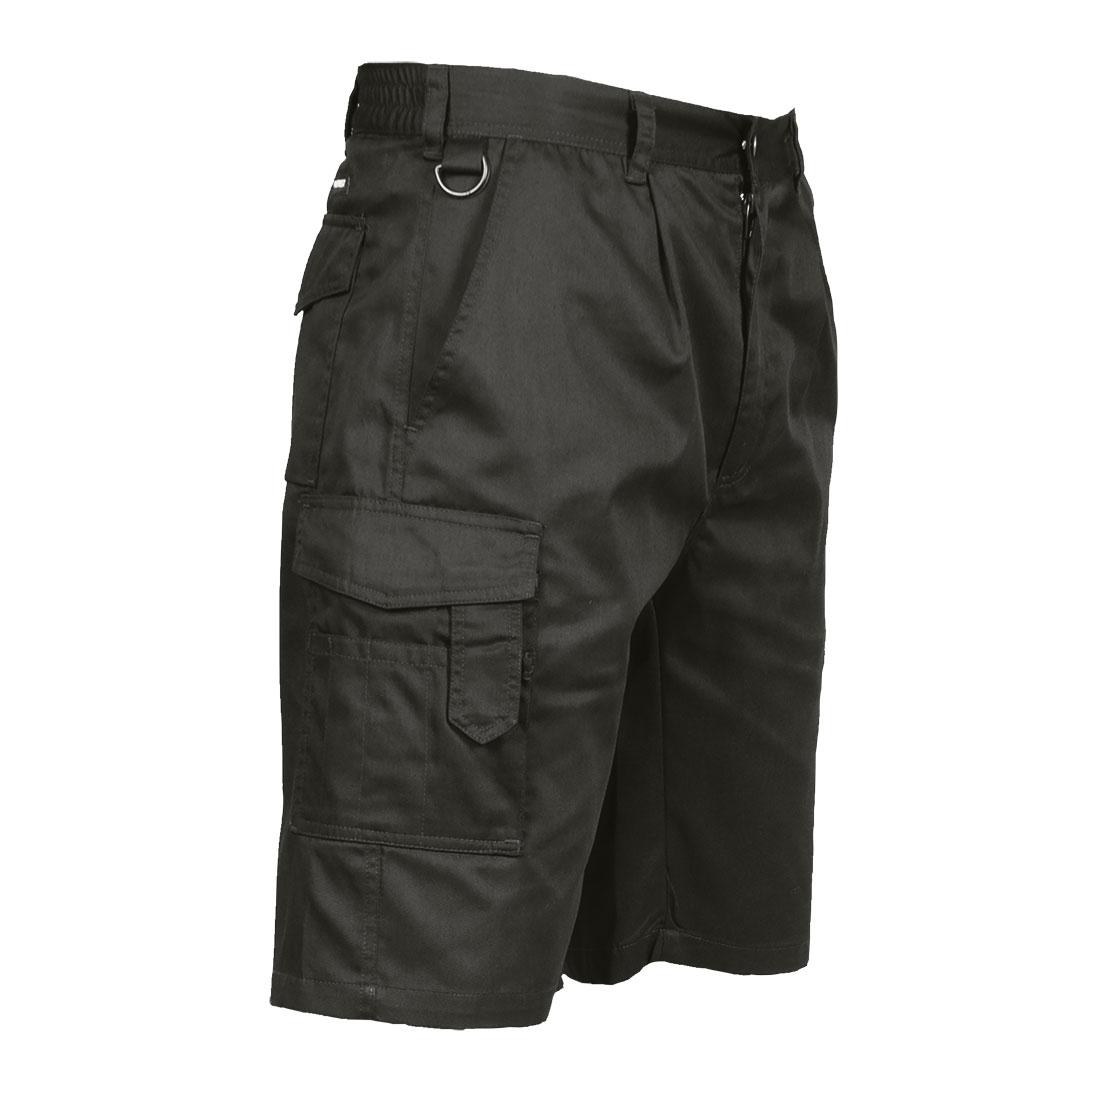 Portwest Combat Shorts - Black